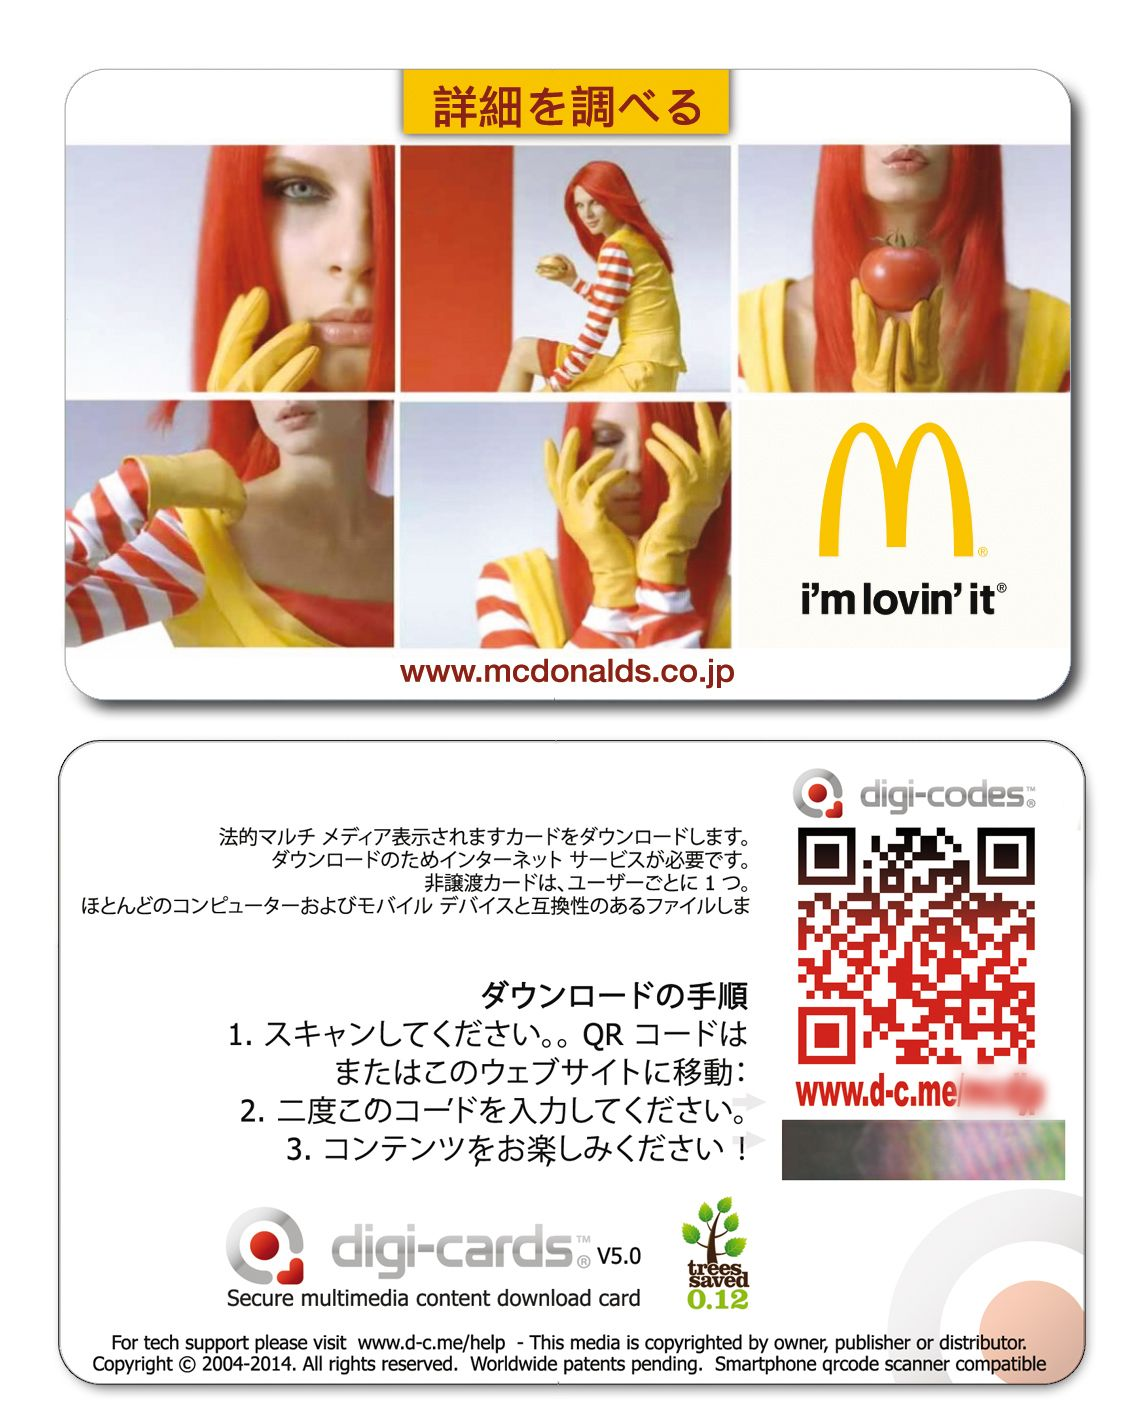 Google Play Krw 100000 Gift Card Korea Account In 2021 Itunes Card Free Itunes Gift Card Itunes Gift Cards